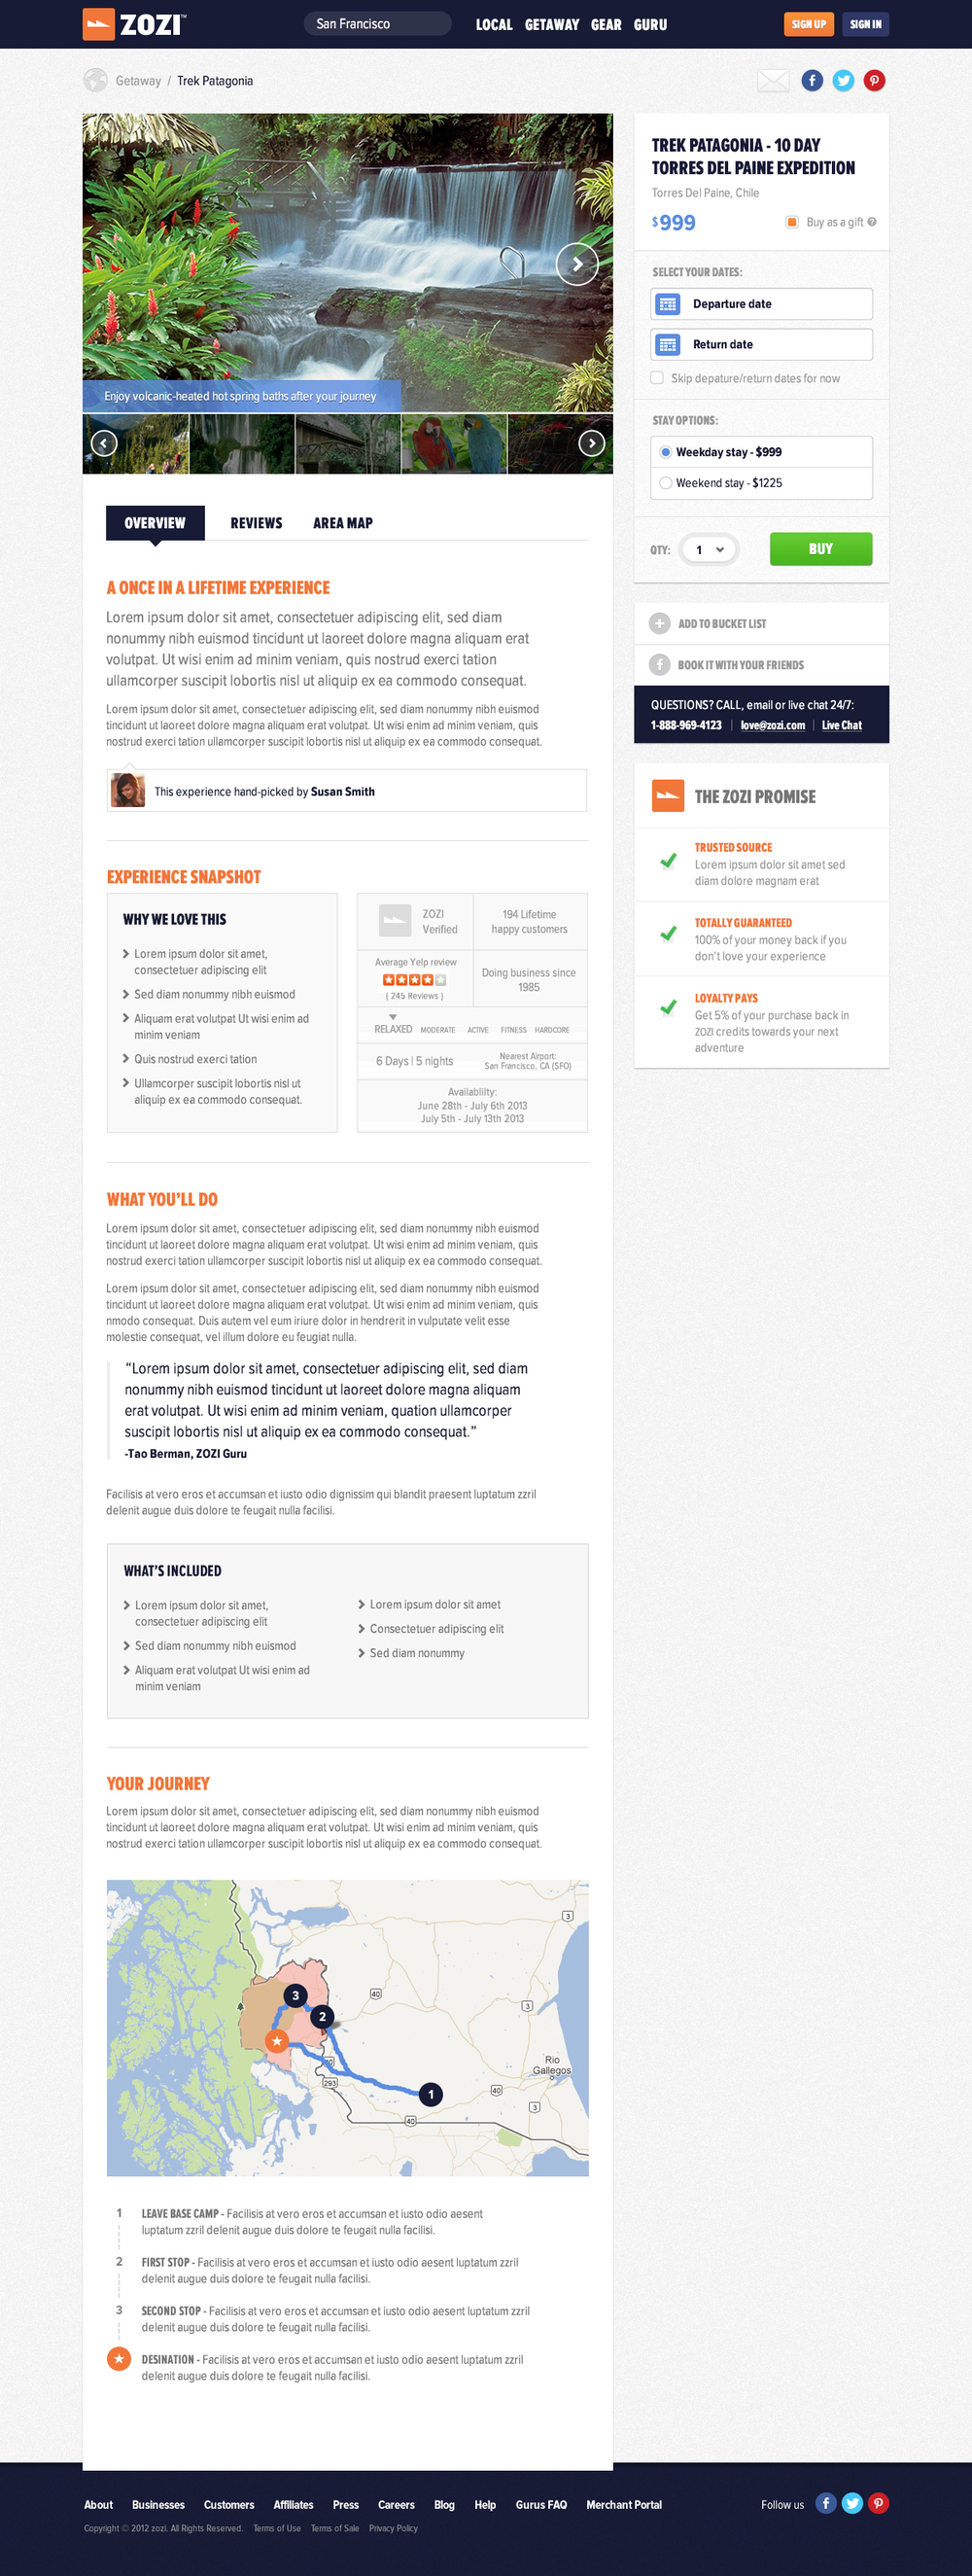 Zoz-Experience_Detail-jt1.jpg